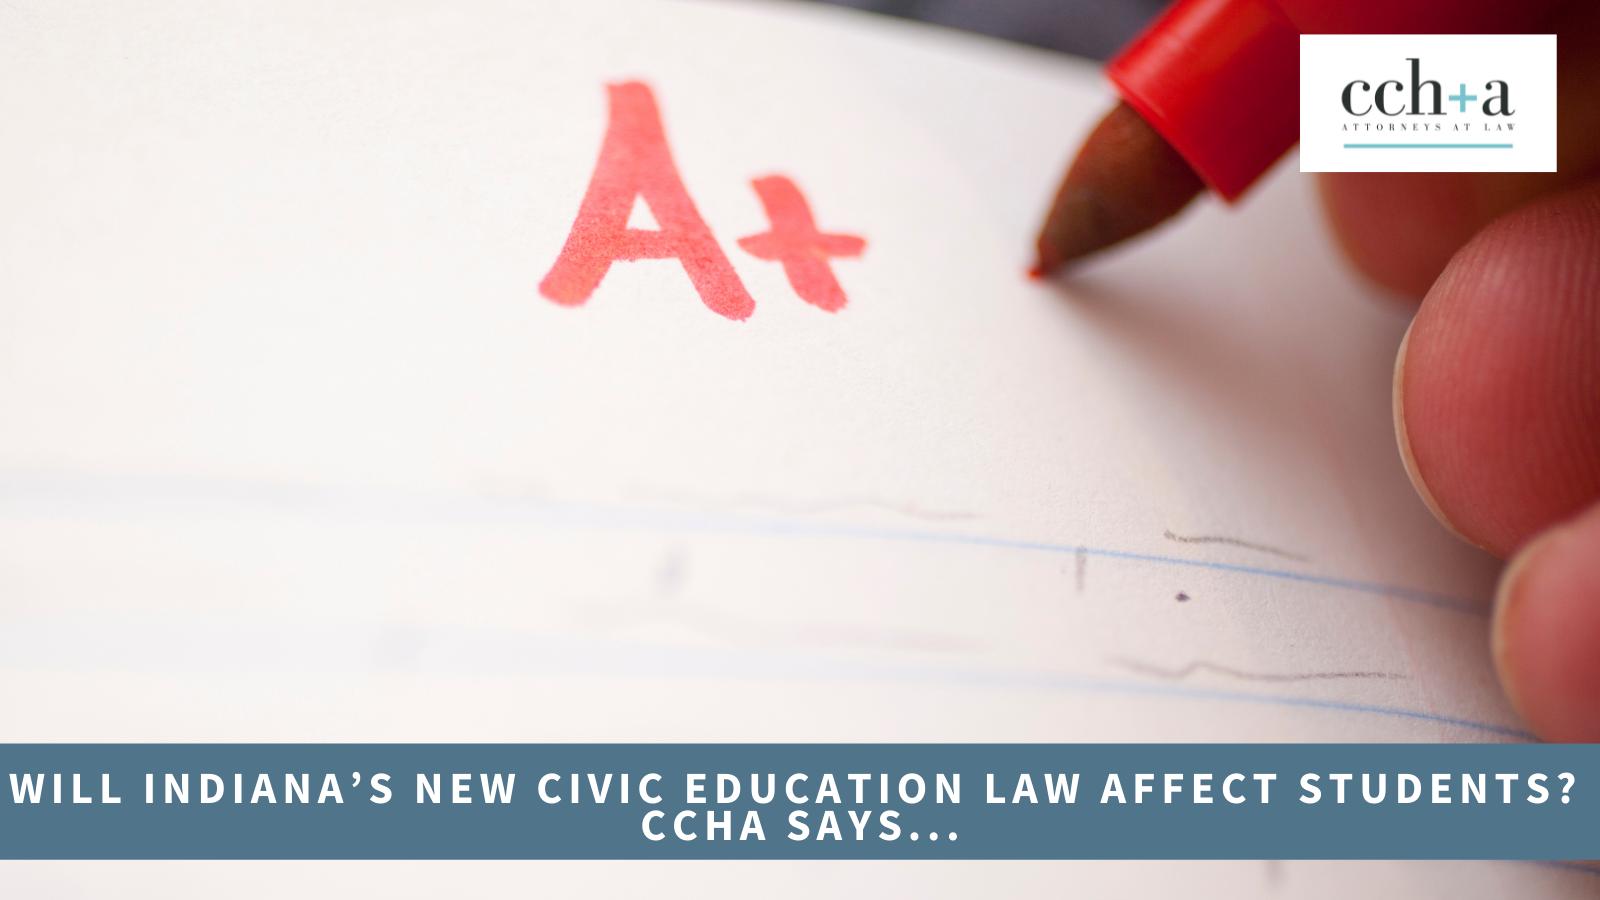 Ccha july 2021 school law civic education law tw